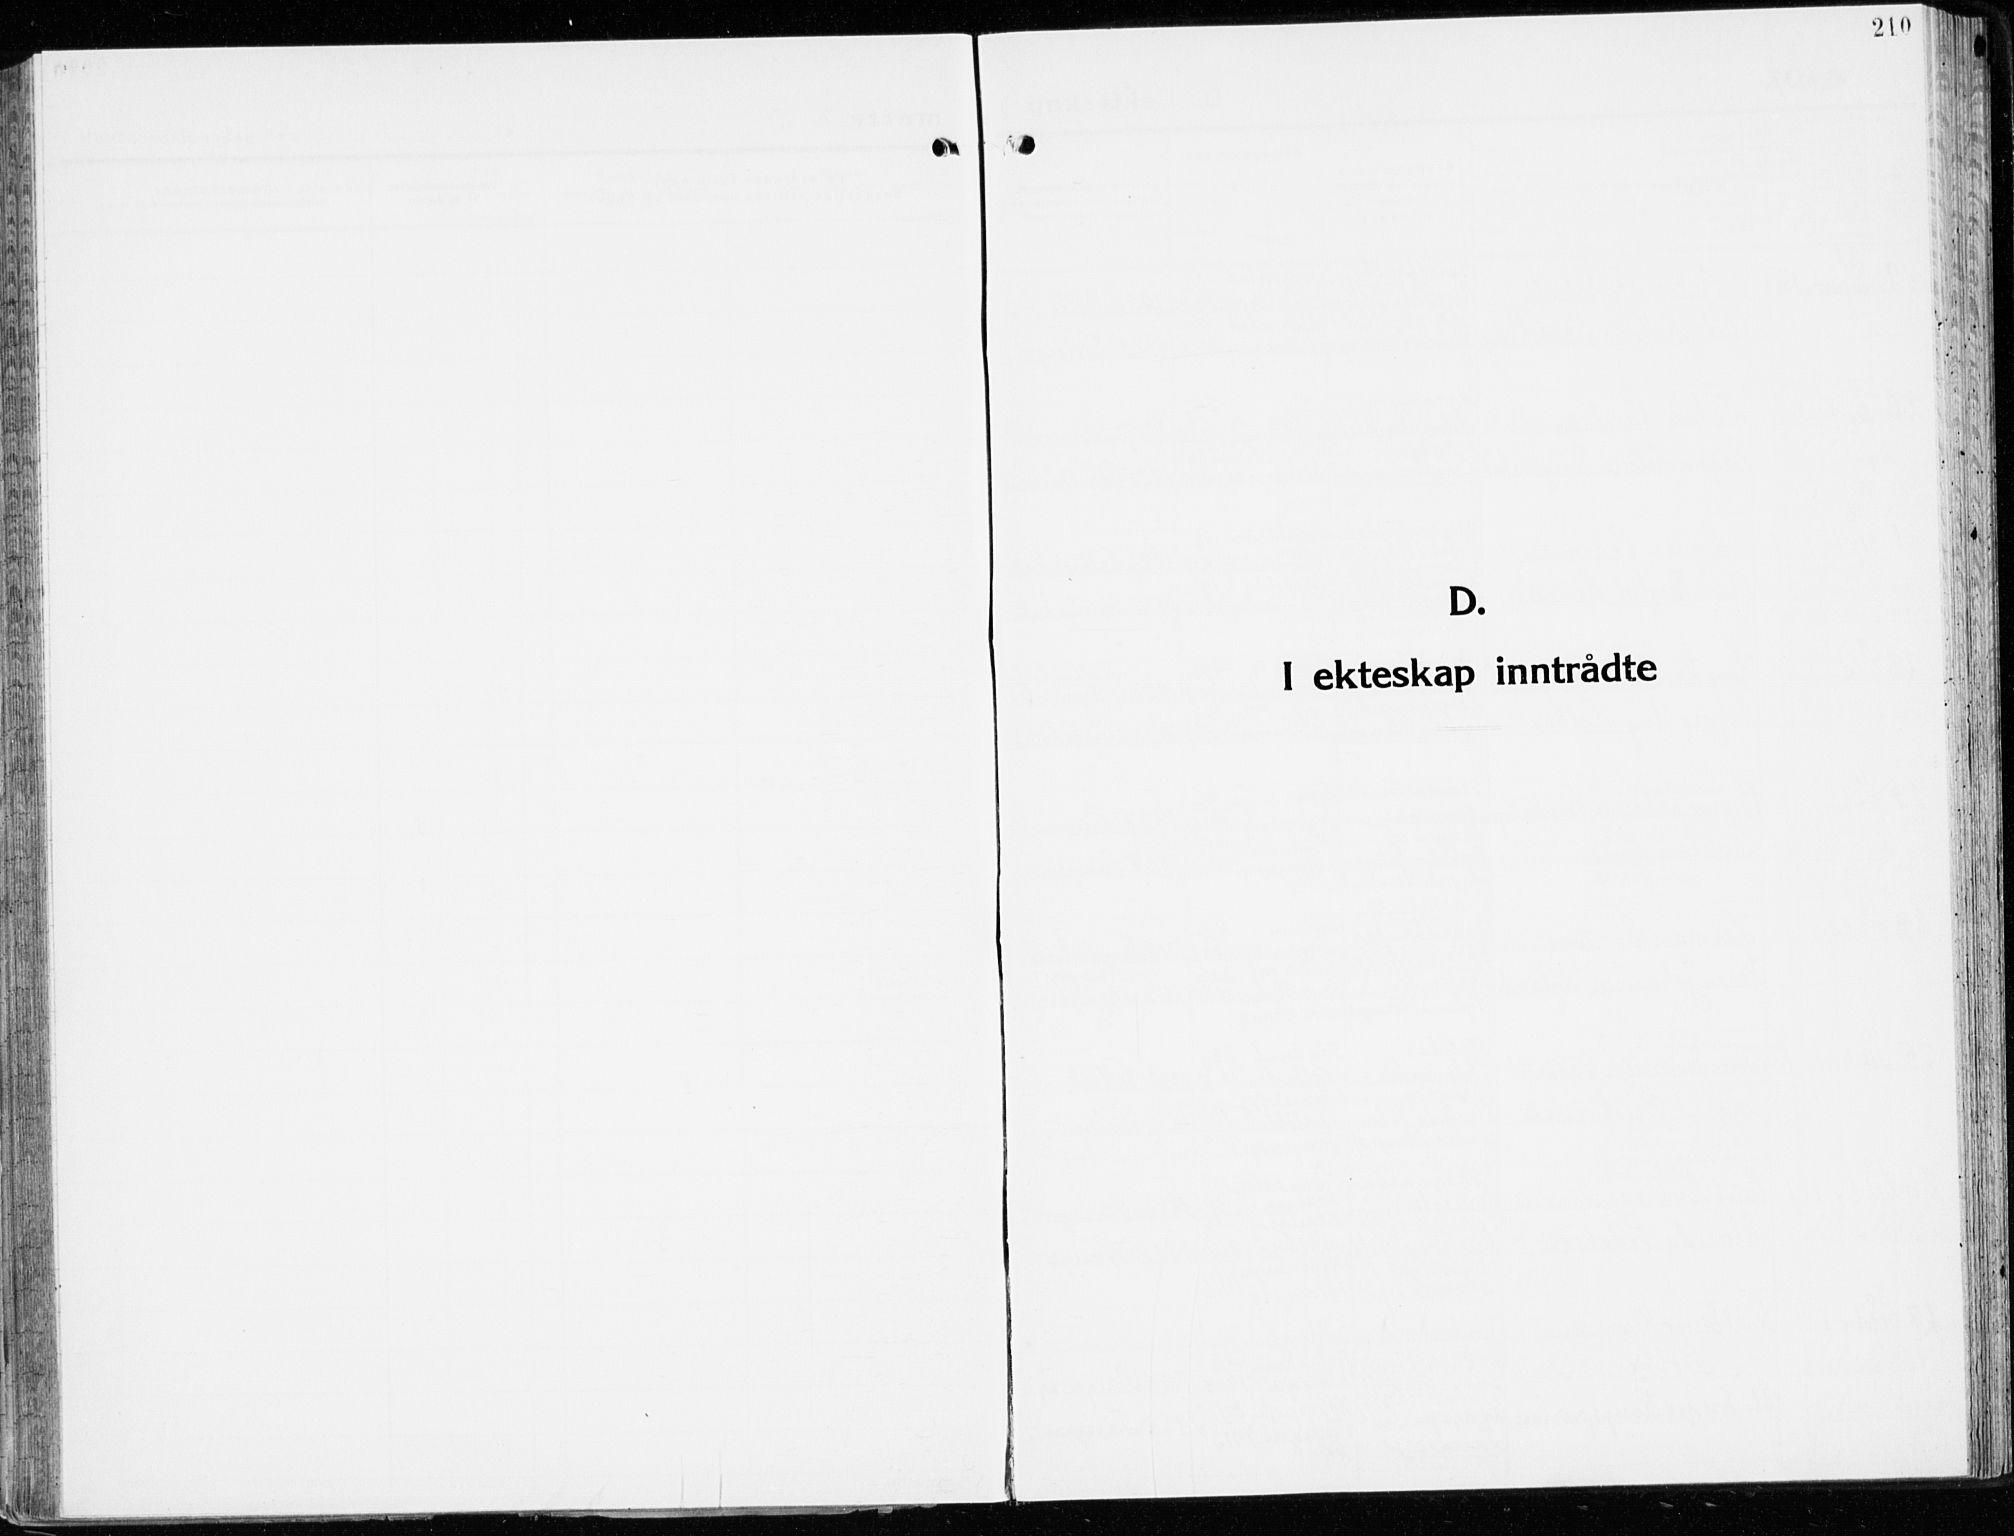 SAH, Stange prestekontor, K/L0027: Ministerialbok nr. 27, 1937-1947, s. 210